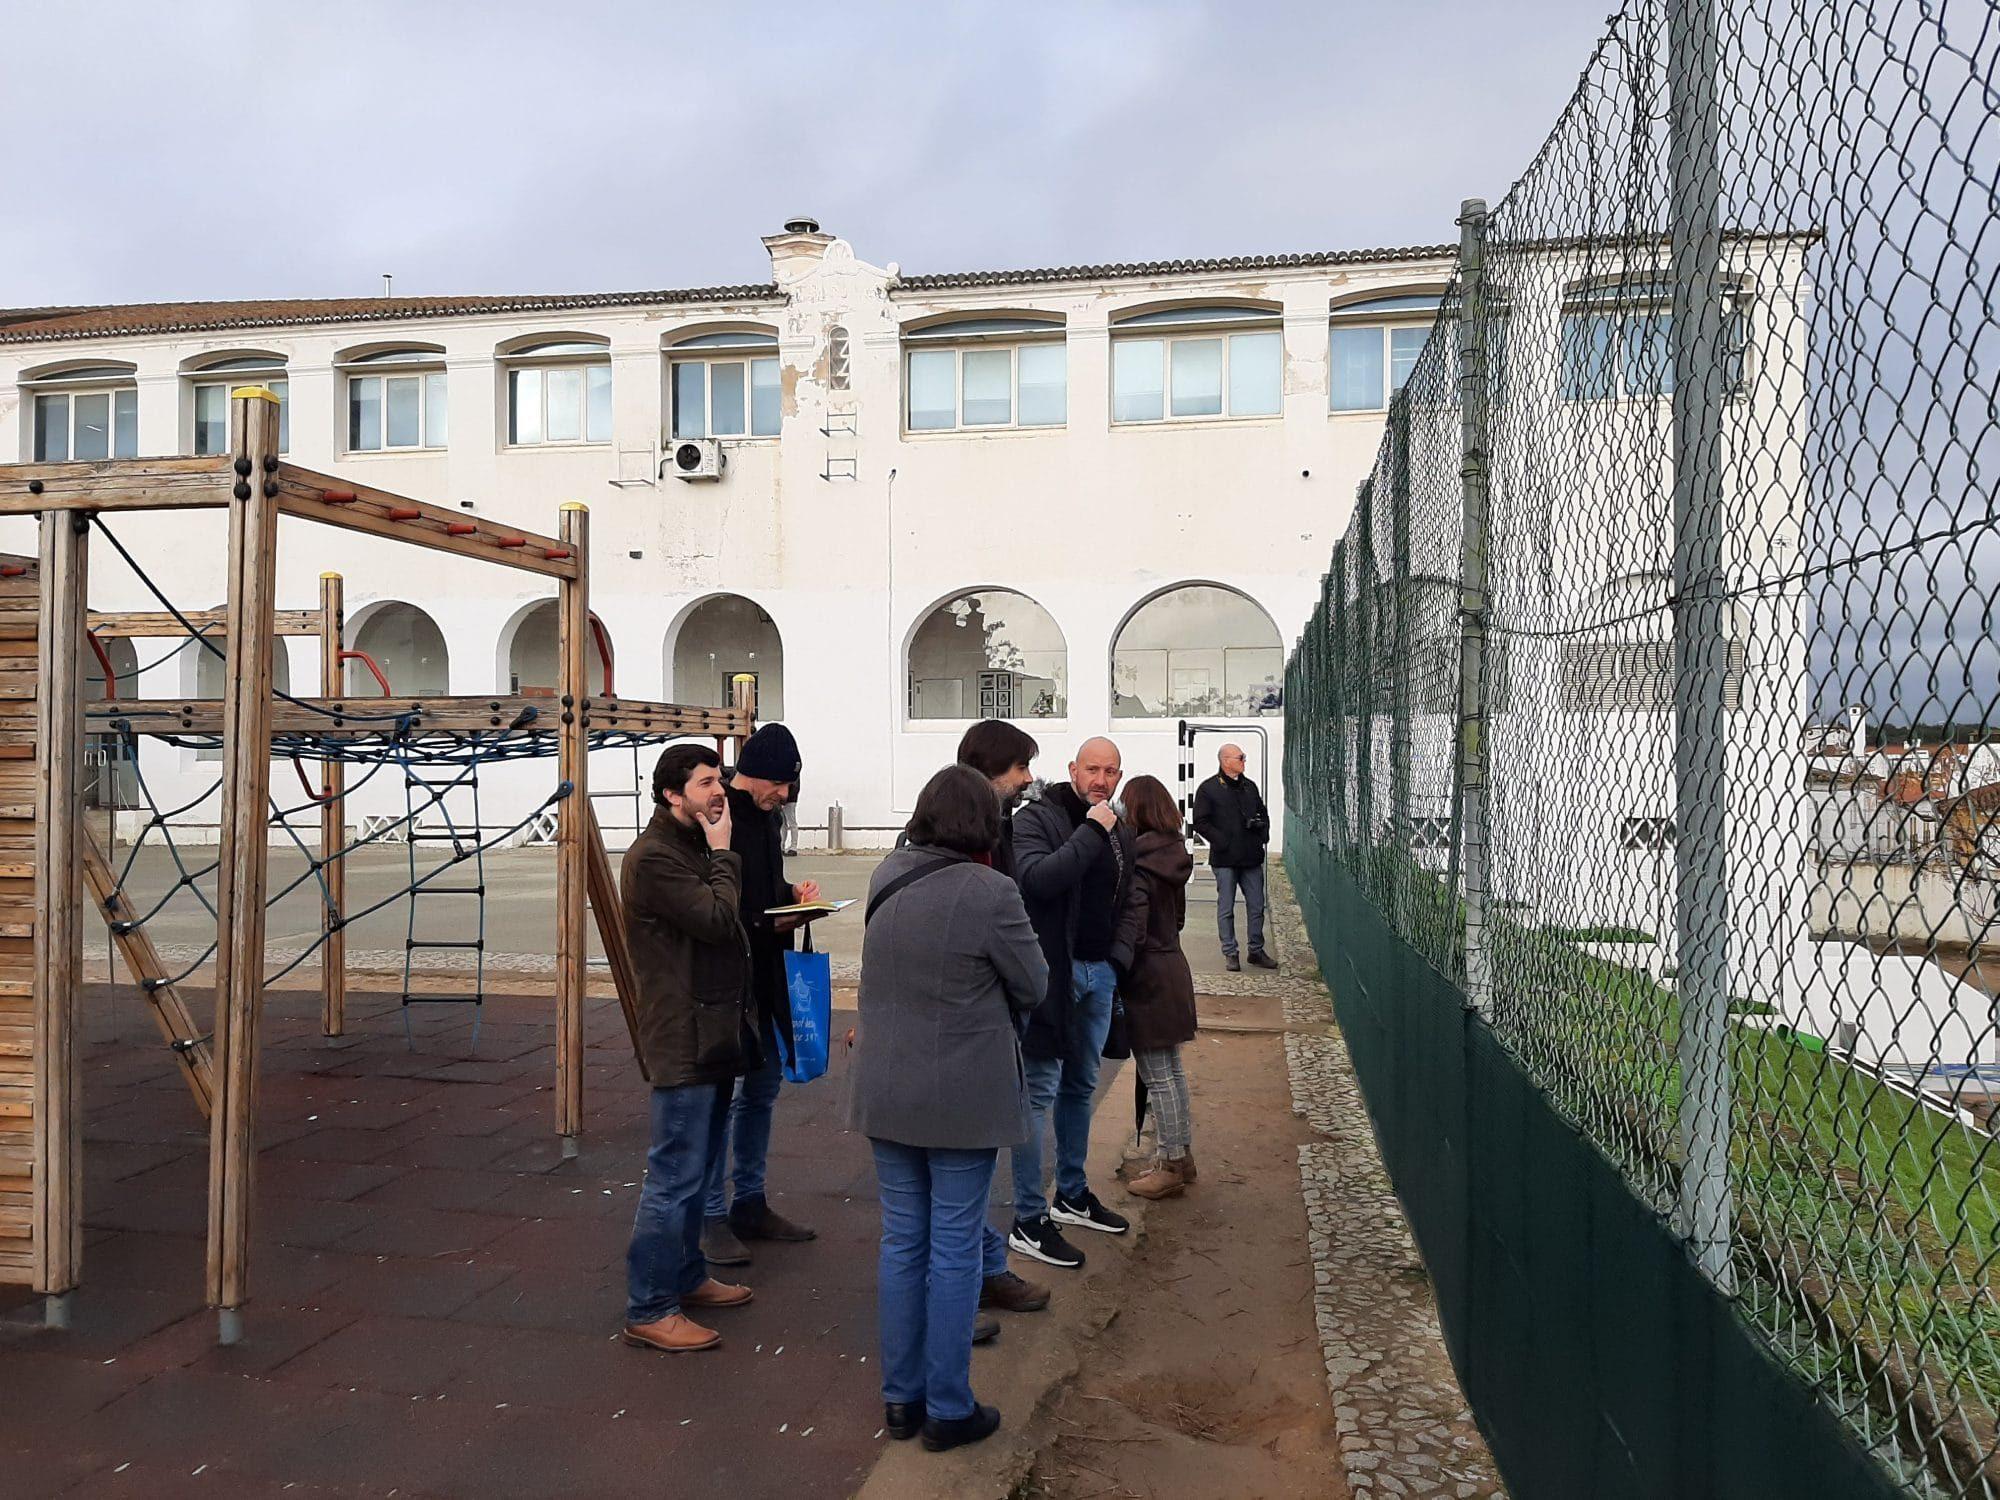 Visit to one of Évora's demosites